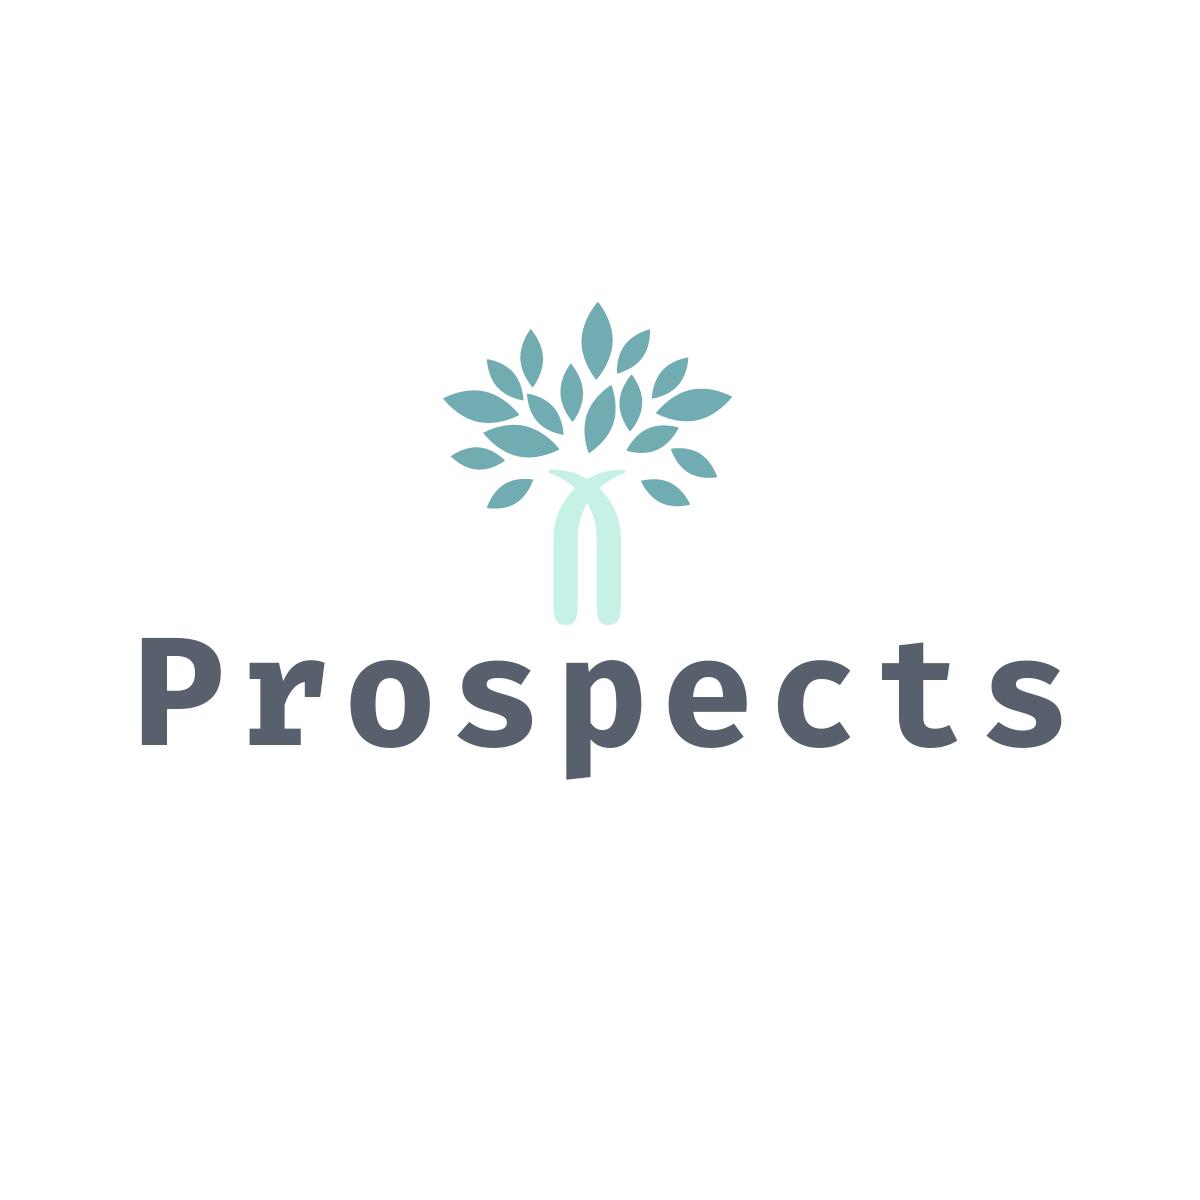 https://my.mncjobz.com/company/prospects-executive